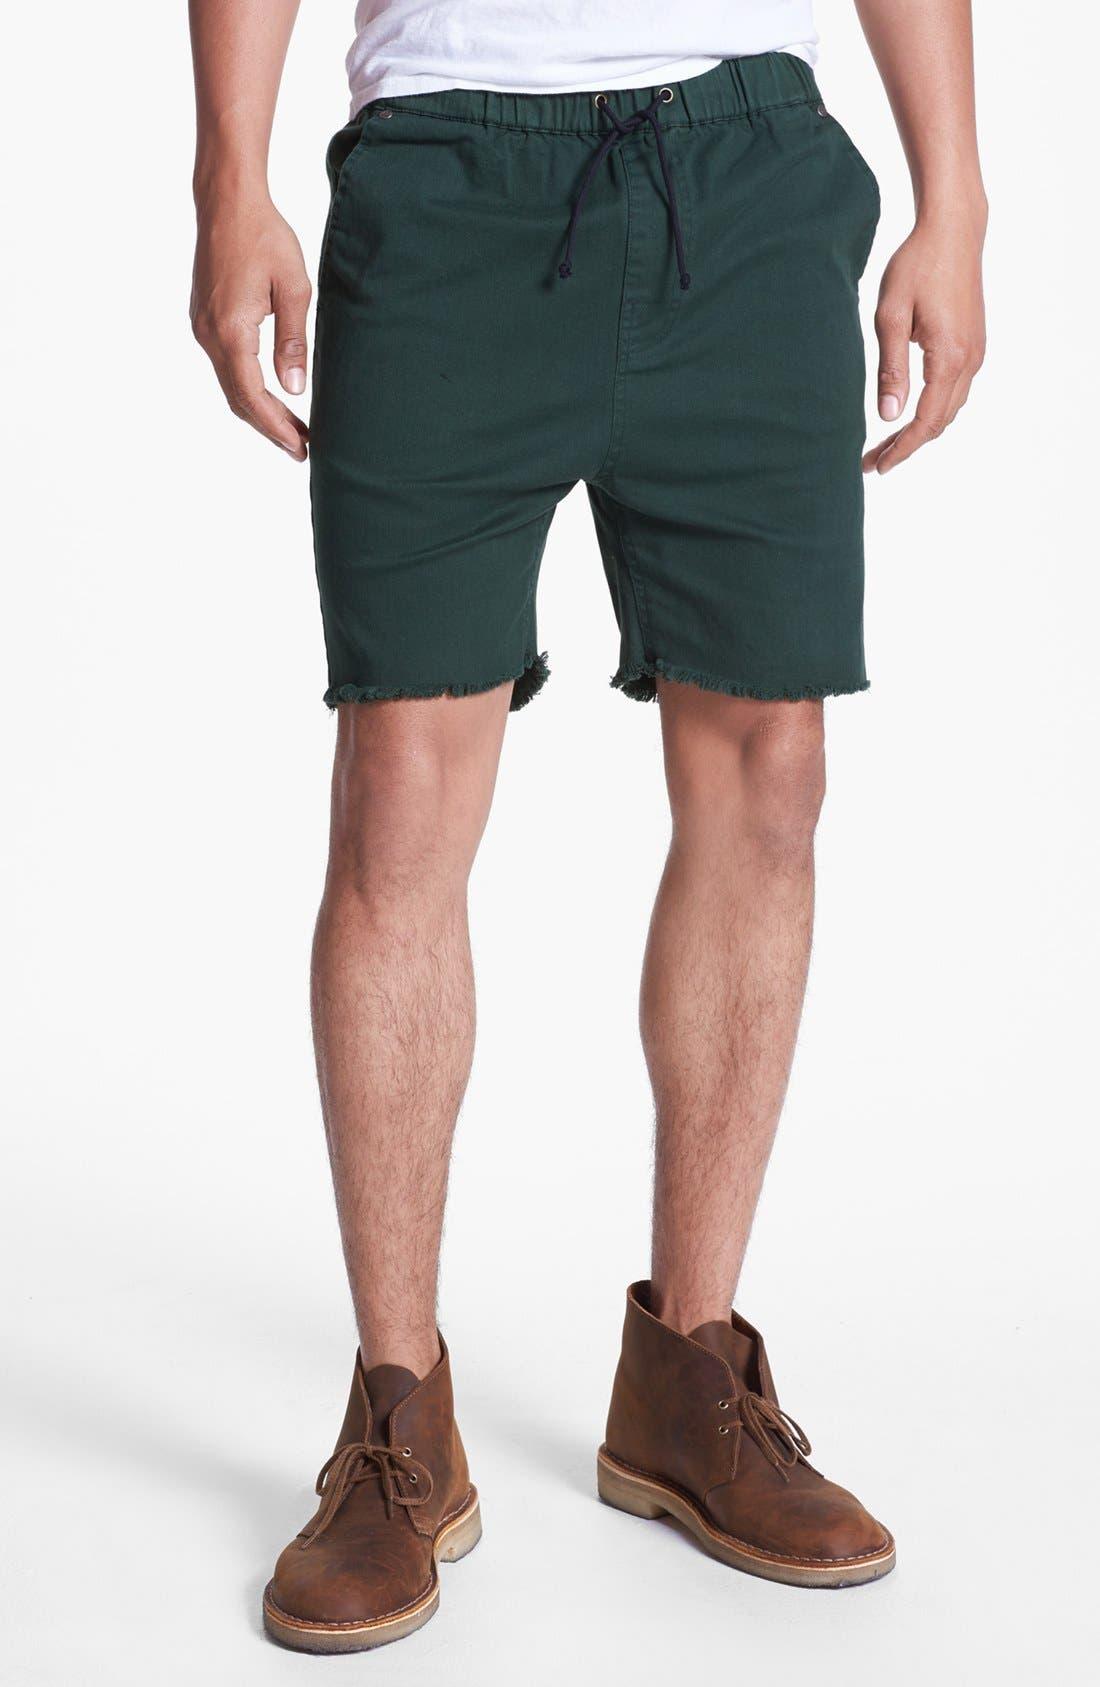 Alternate Image 1 Selected - Vanguard 'Nu Wave' Shorts